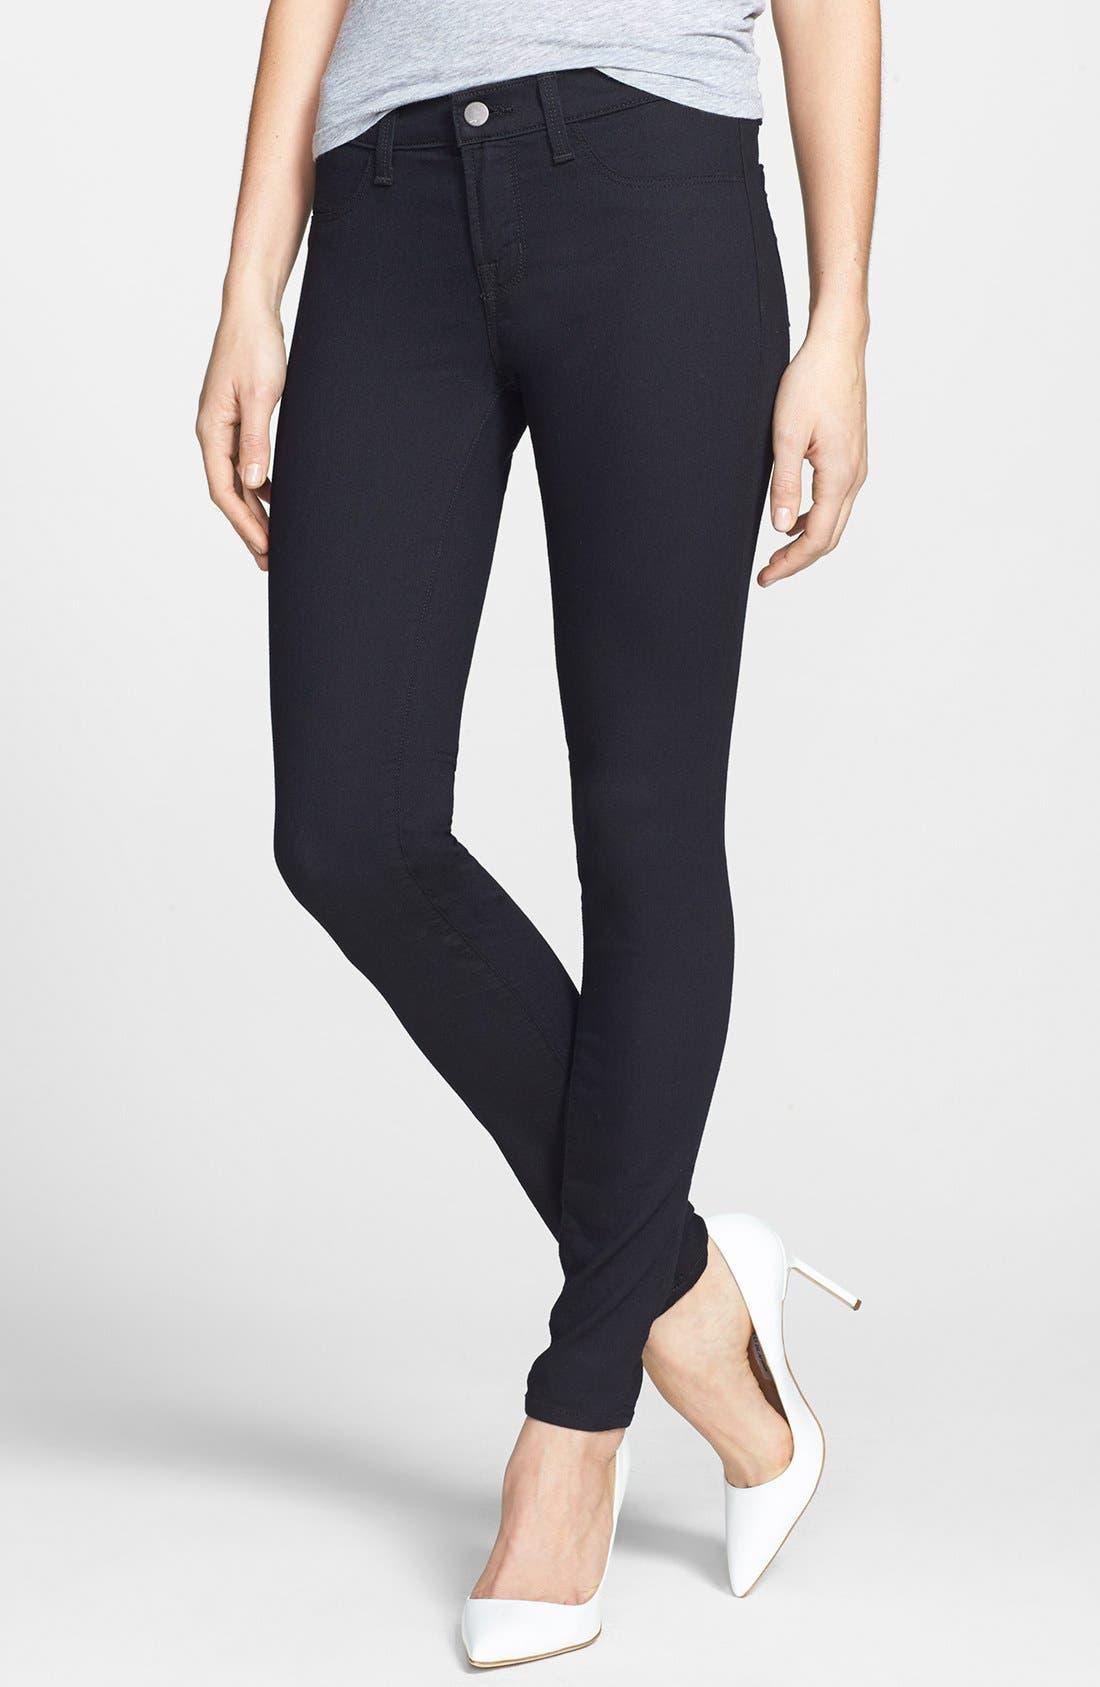 Alternate Image 1 Selected - J Brand Super Skinny Jeans (Pitch Black)